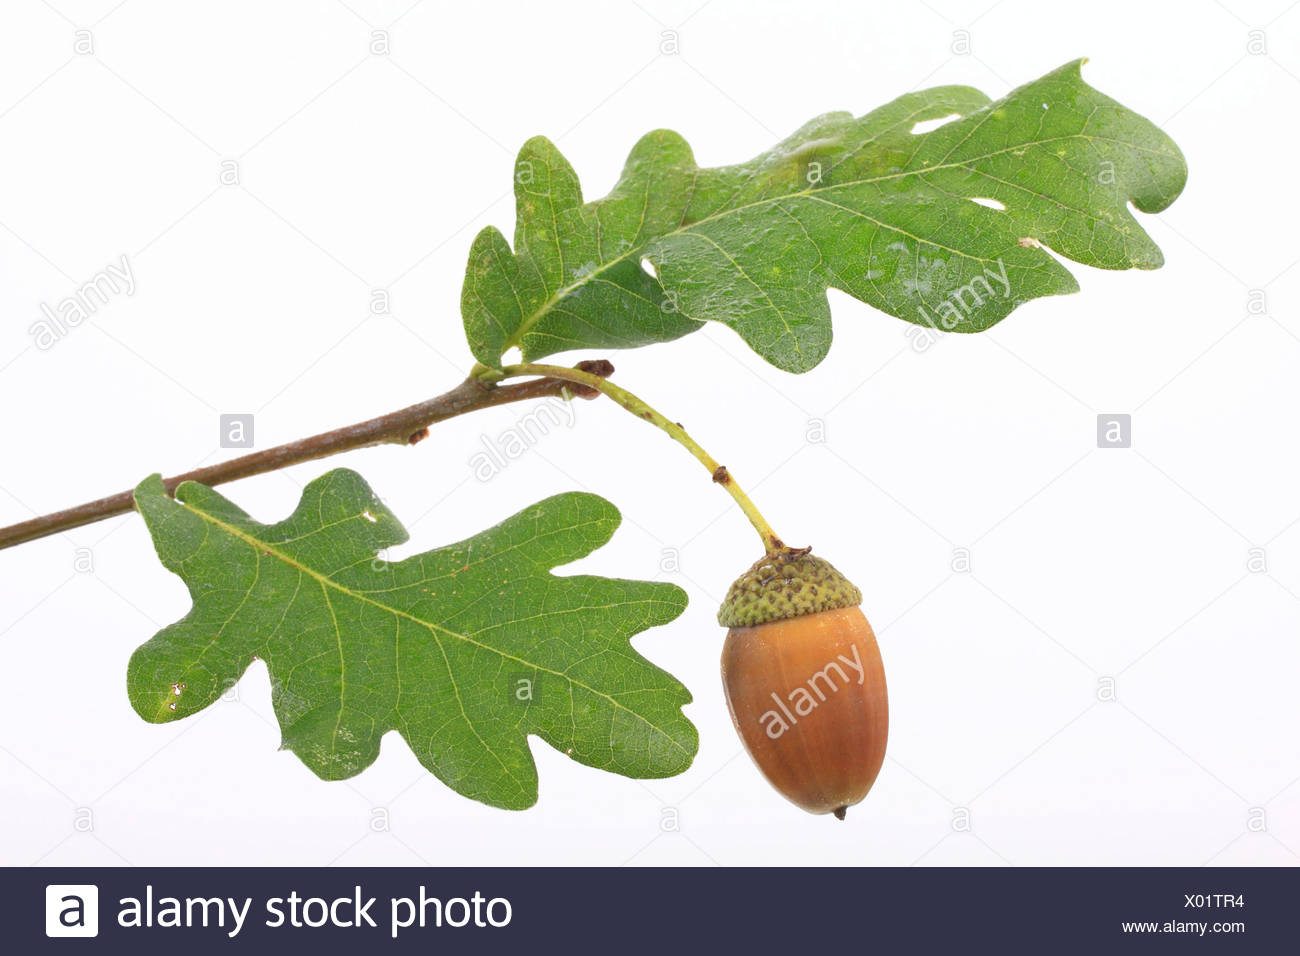 An acorn with oak leaves, English oak (Quercus robur) - Stock Image